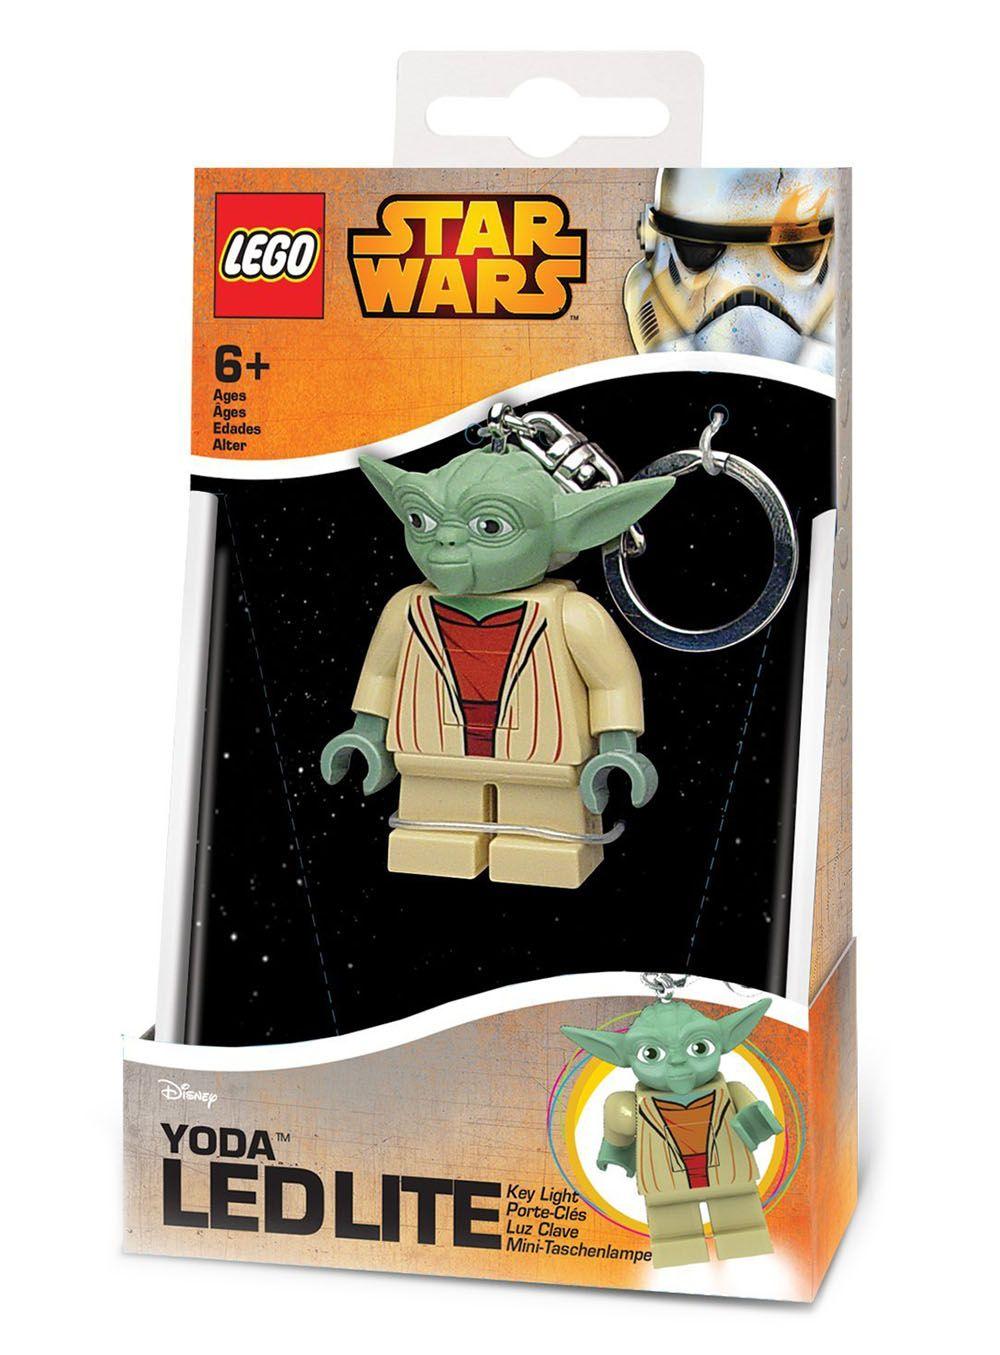 Lego porte cl s lglke11 pas cher porte cl s lumineux ma tre yoda - Maitre yoda lego ...